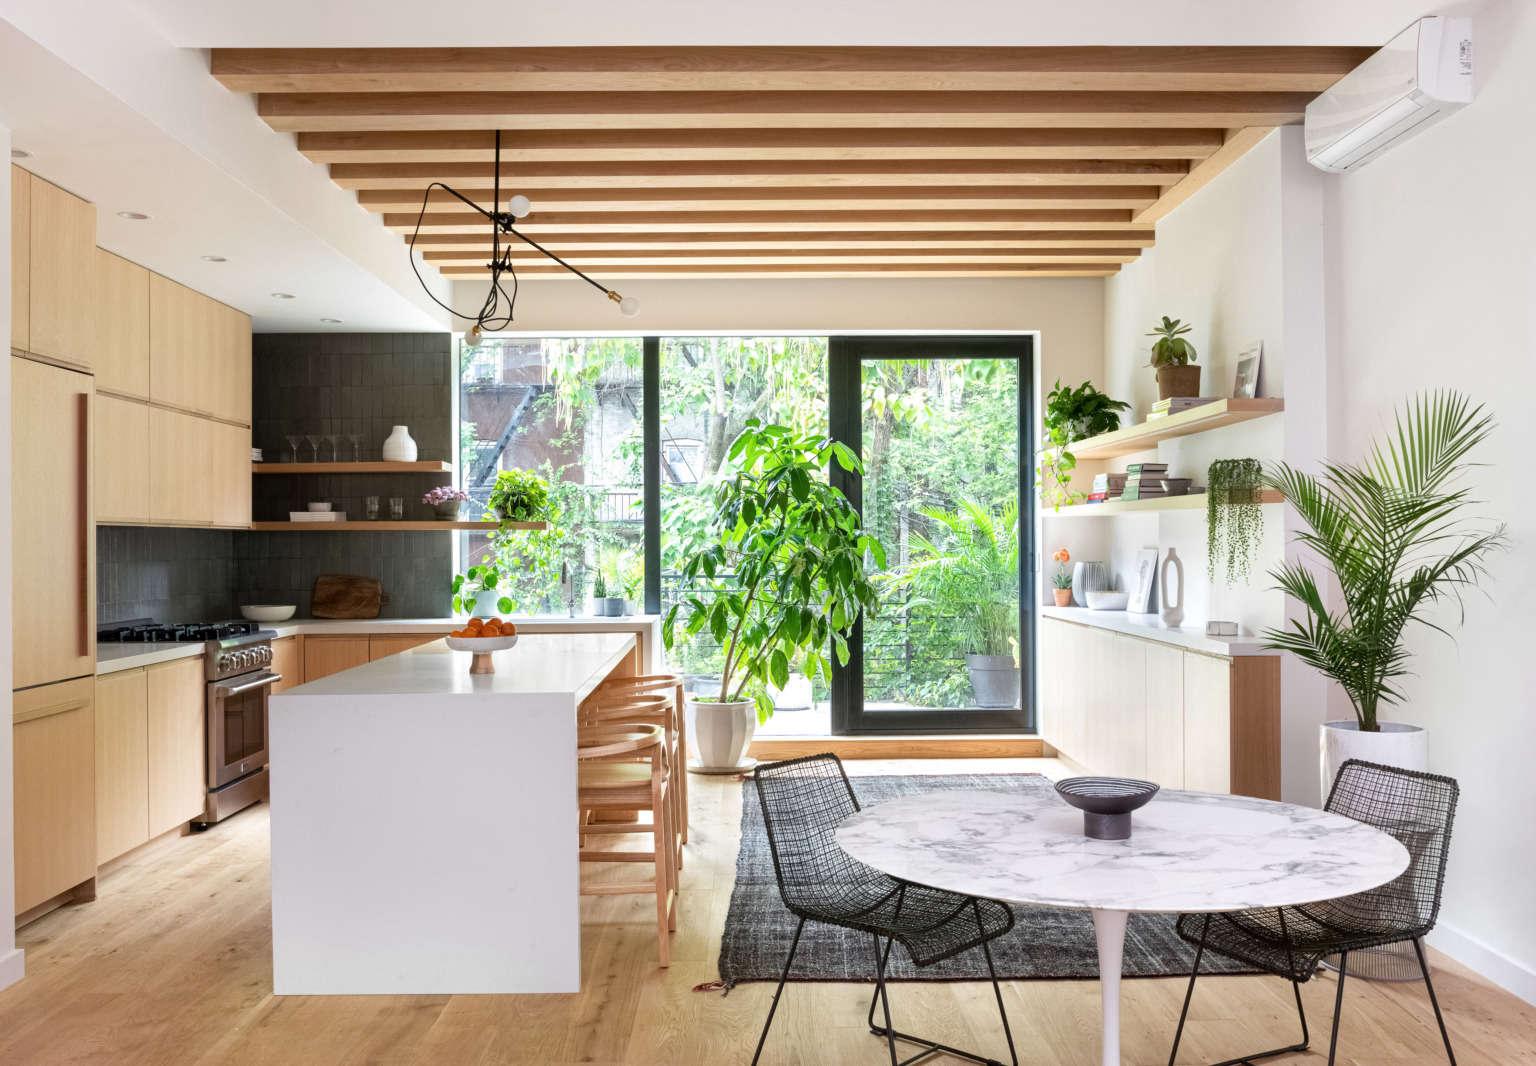 Kitchen of the Week A Scandi Blonde Wood Design in BedStuy Garden Included portrait 3